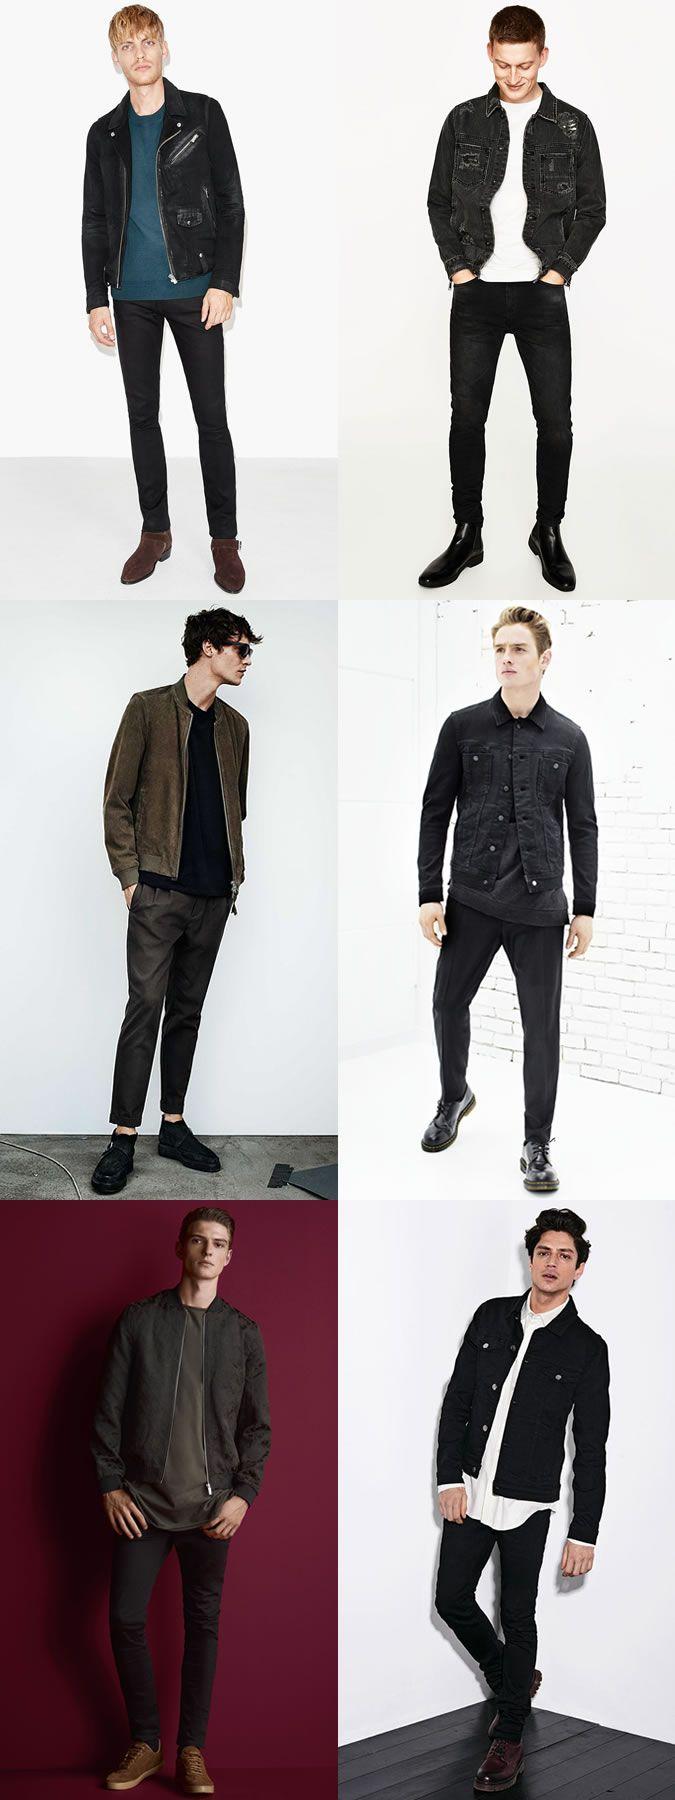 Men's Nightclub Outfit Inspiration Lookbook